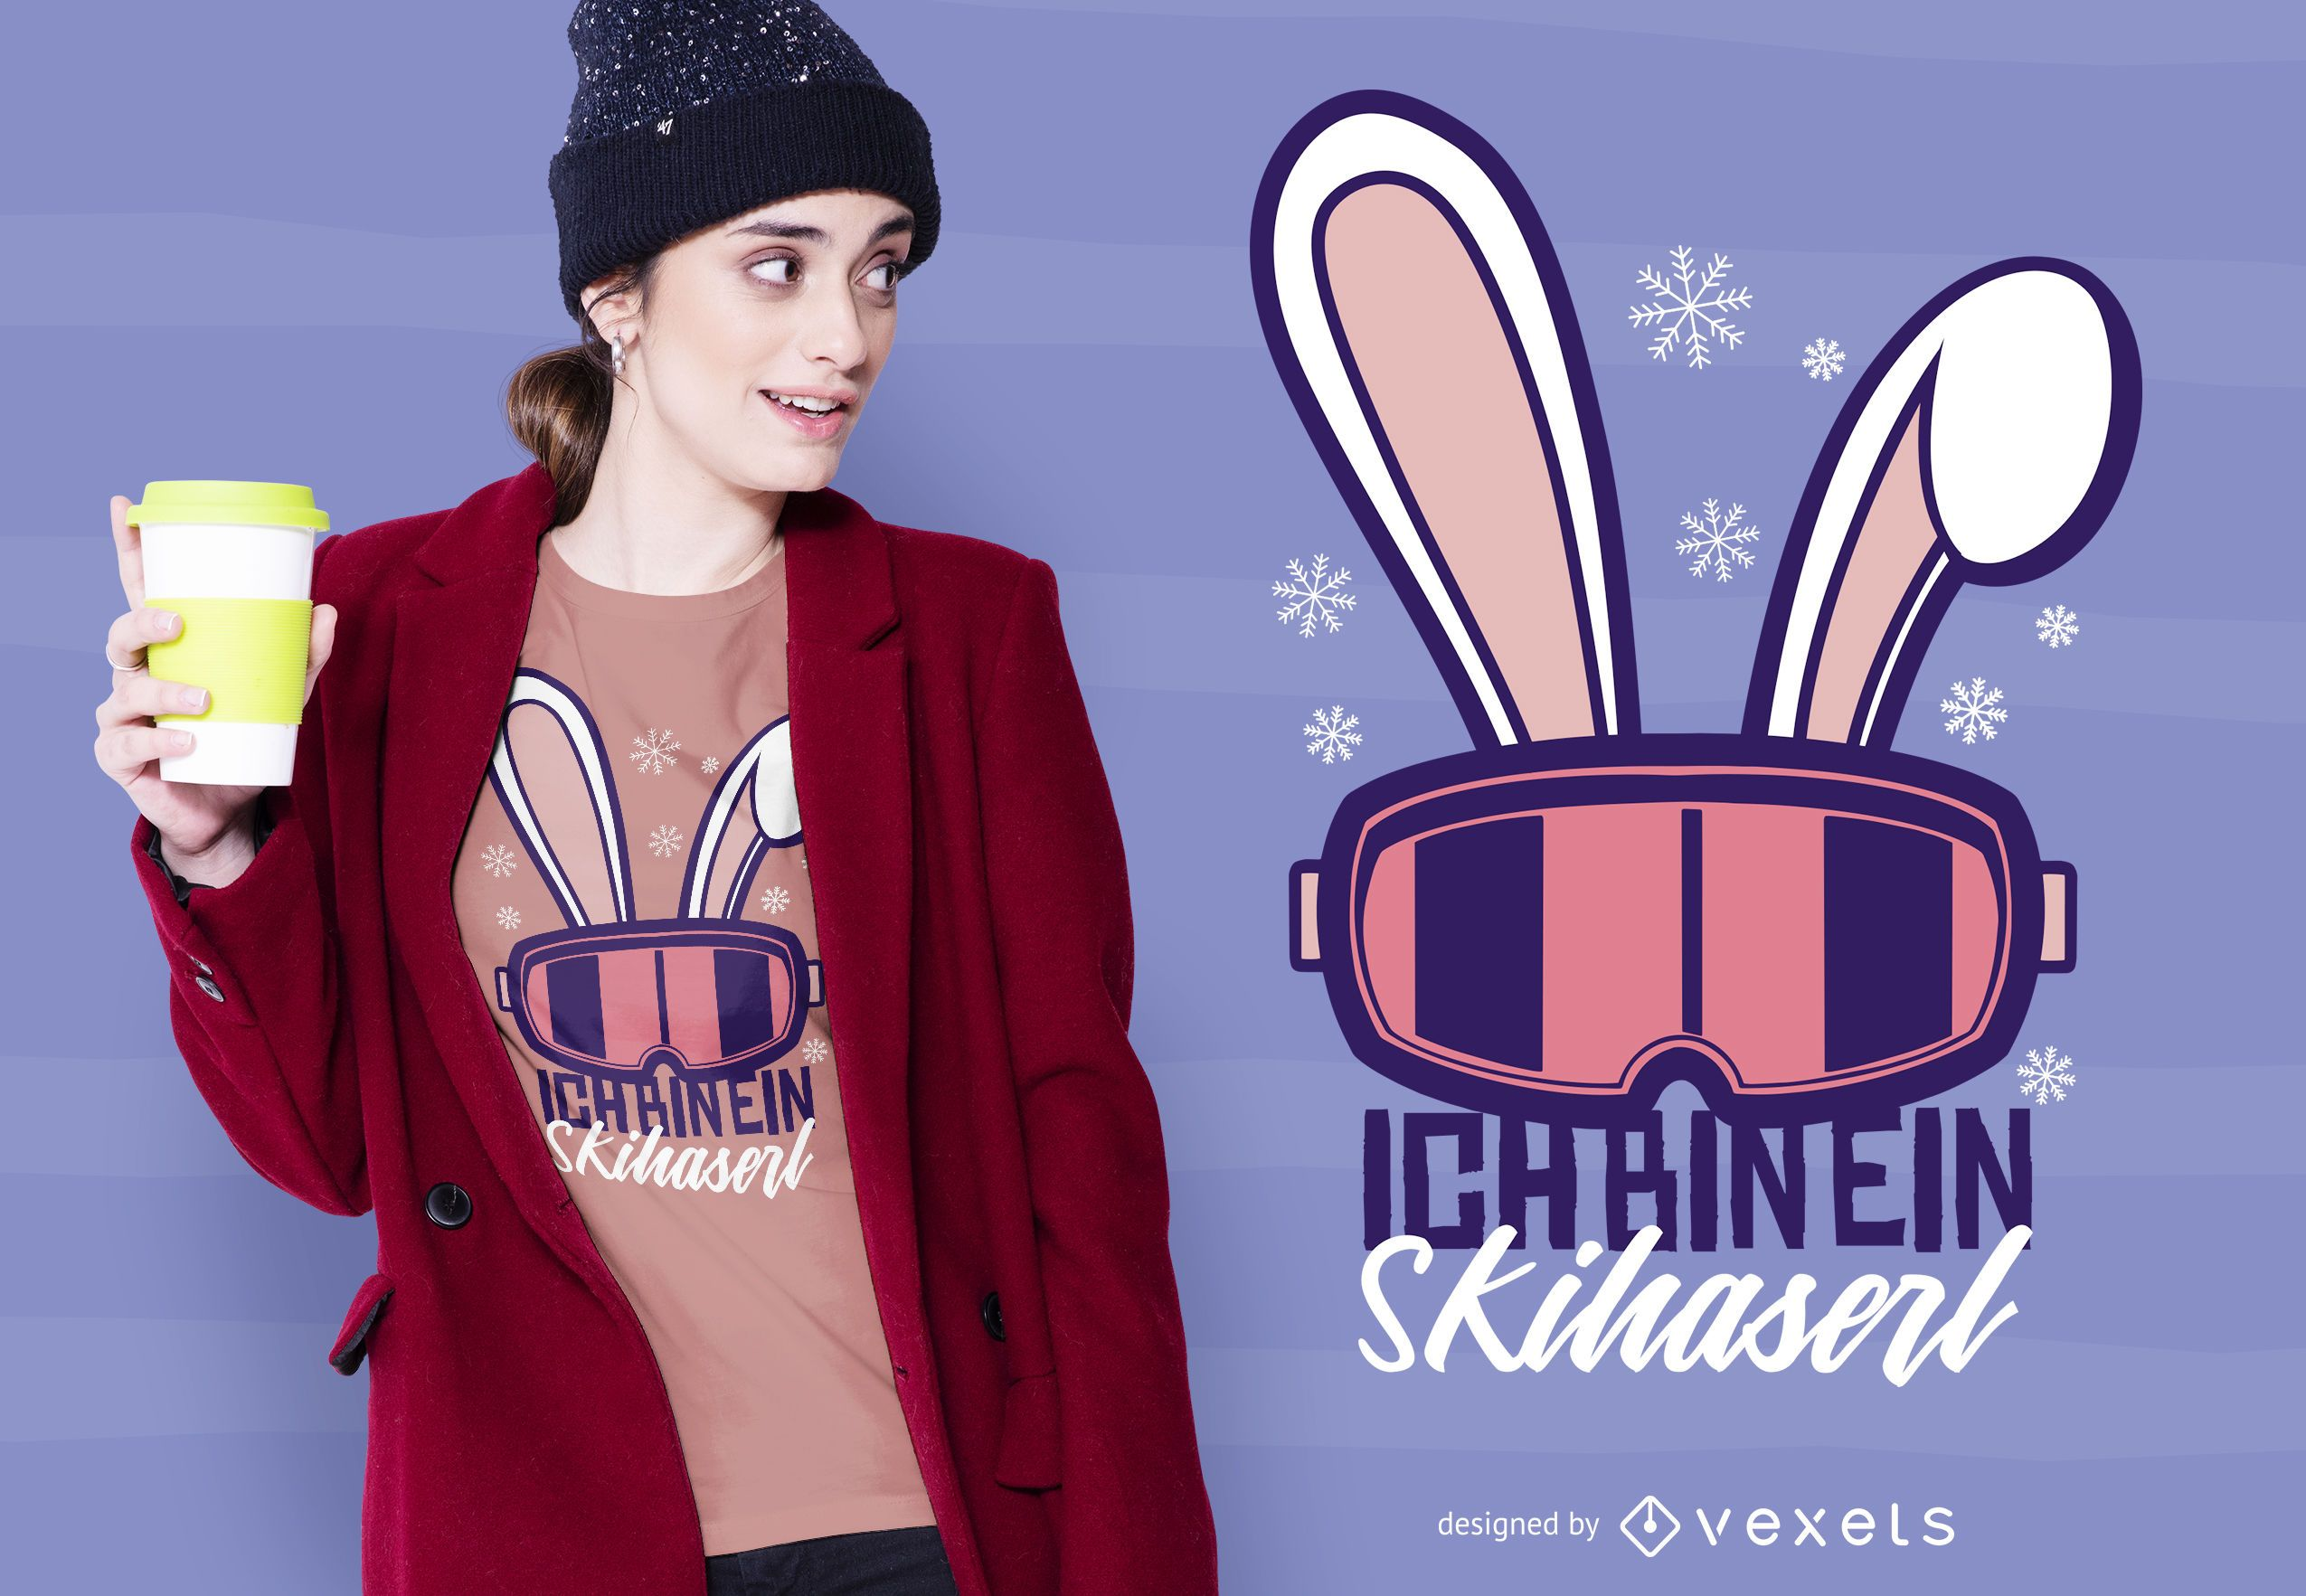 Snow Rabbit German T-shirt Design